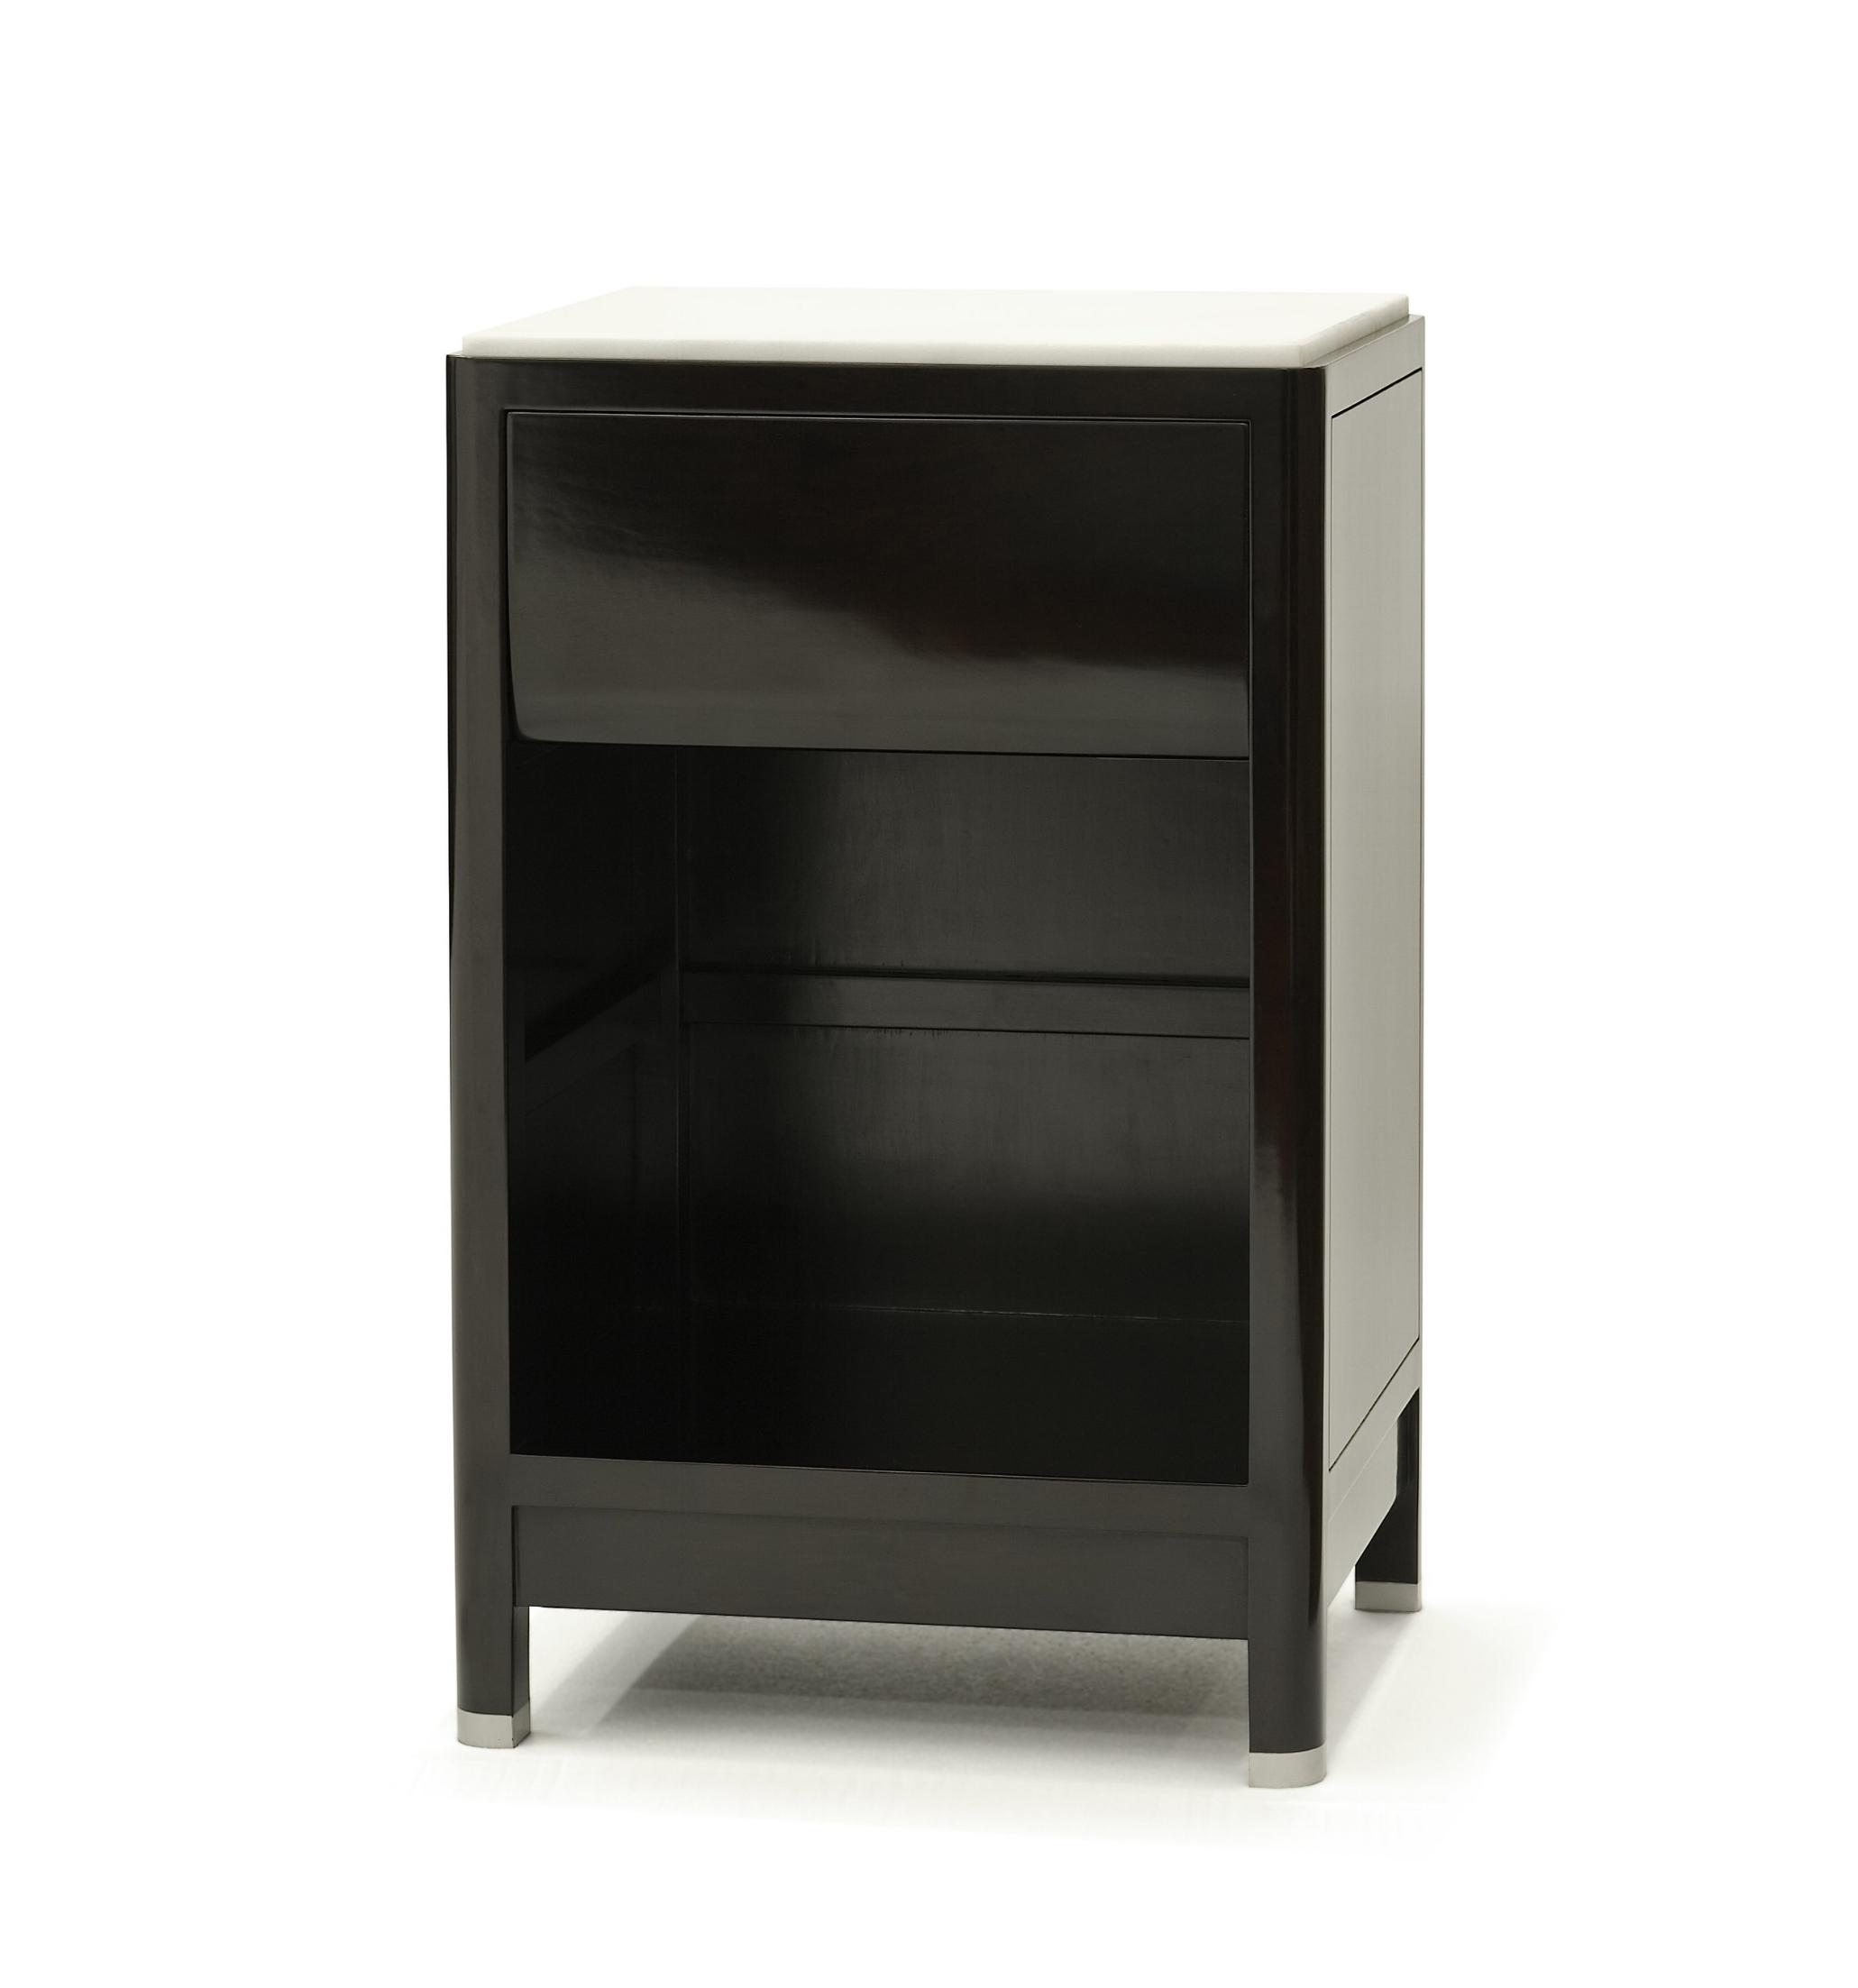 ....Custom made Art deco style furniture : cabinet..特别定制艺术装饰风格家具:柜....